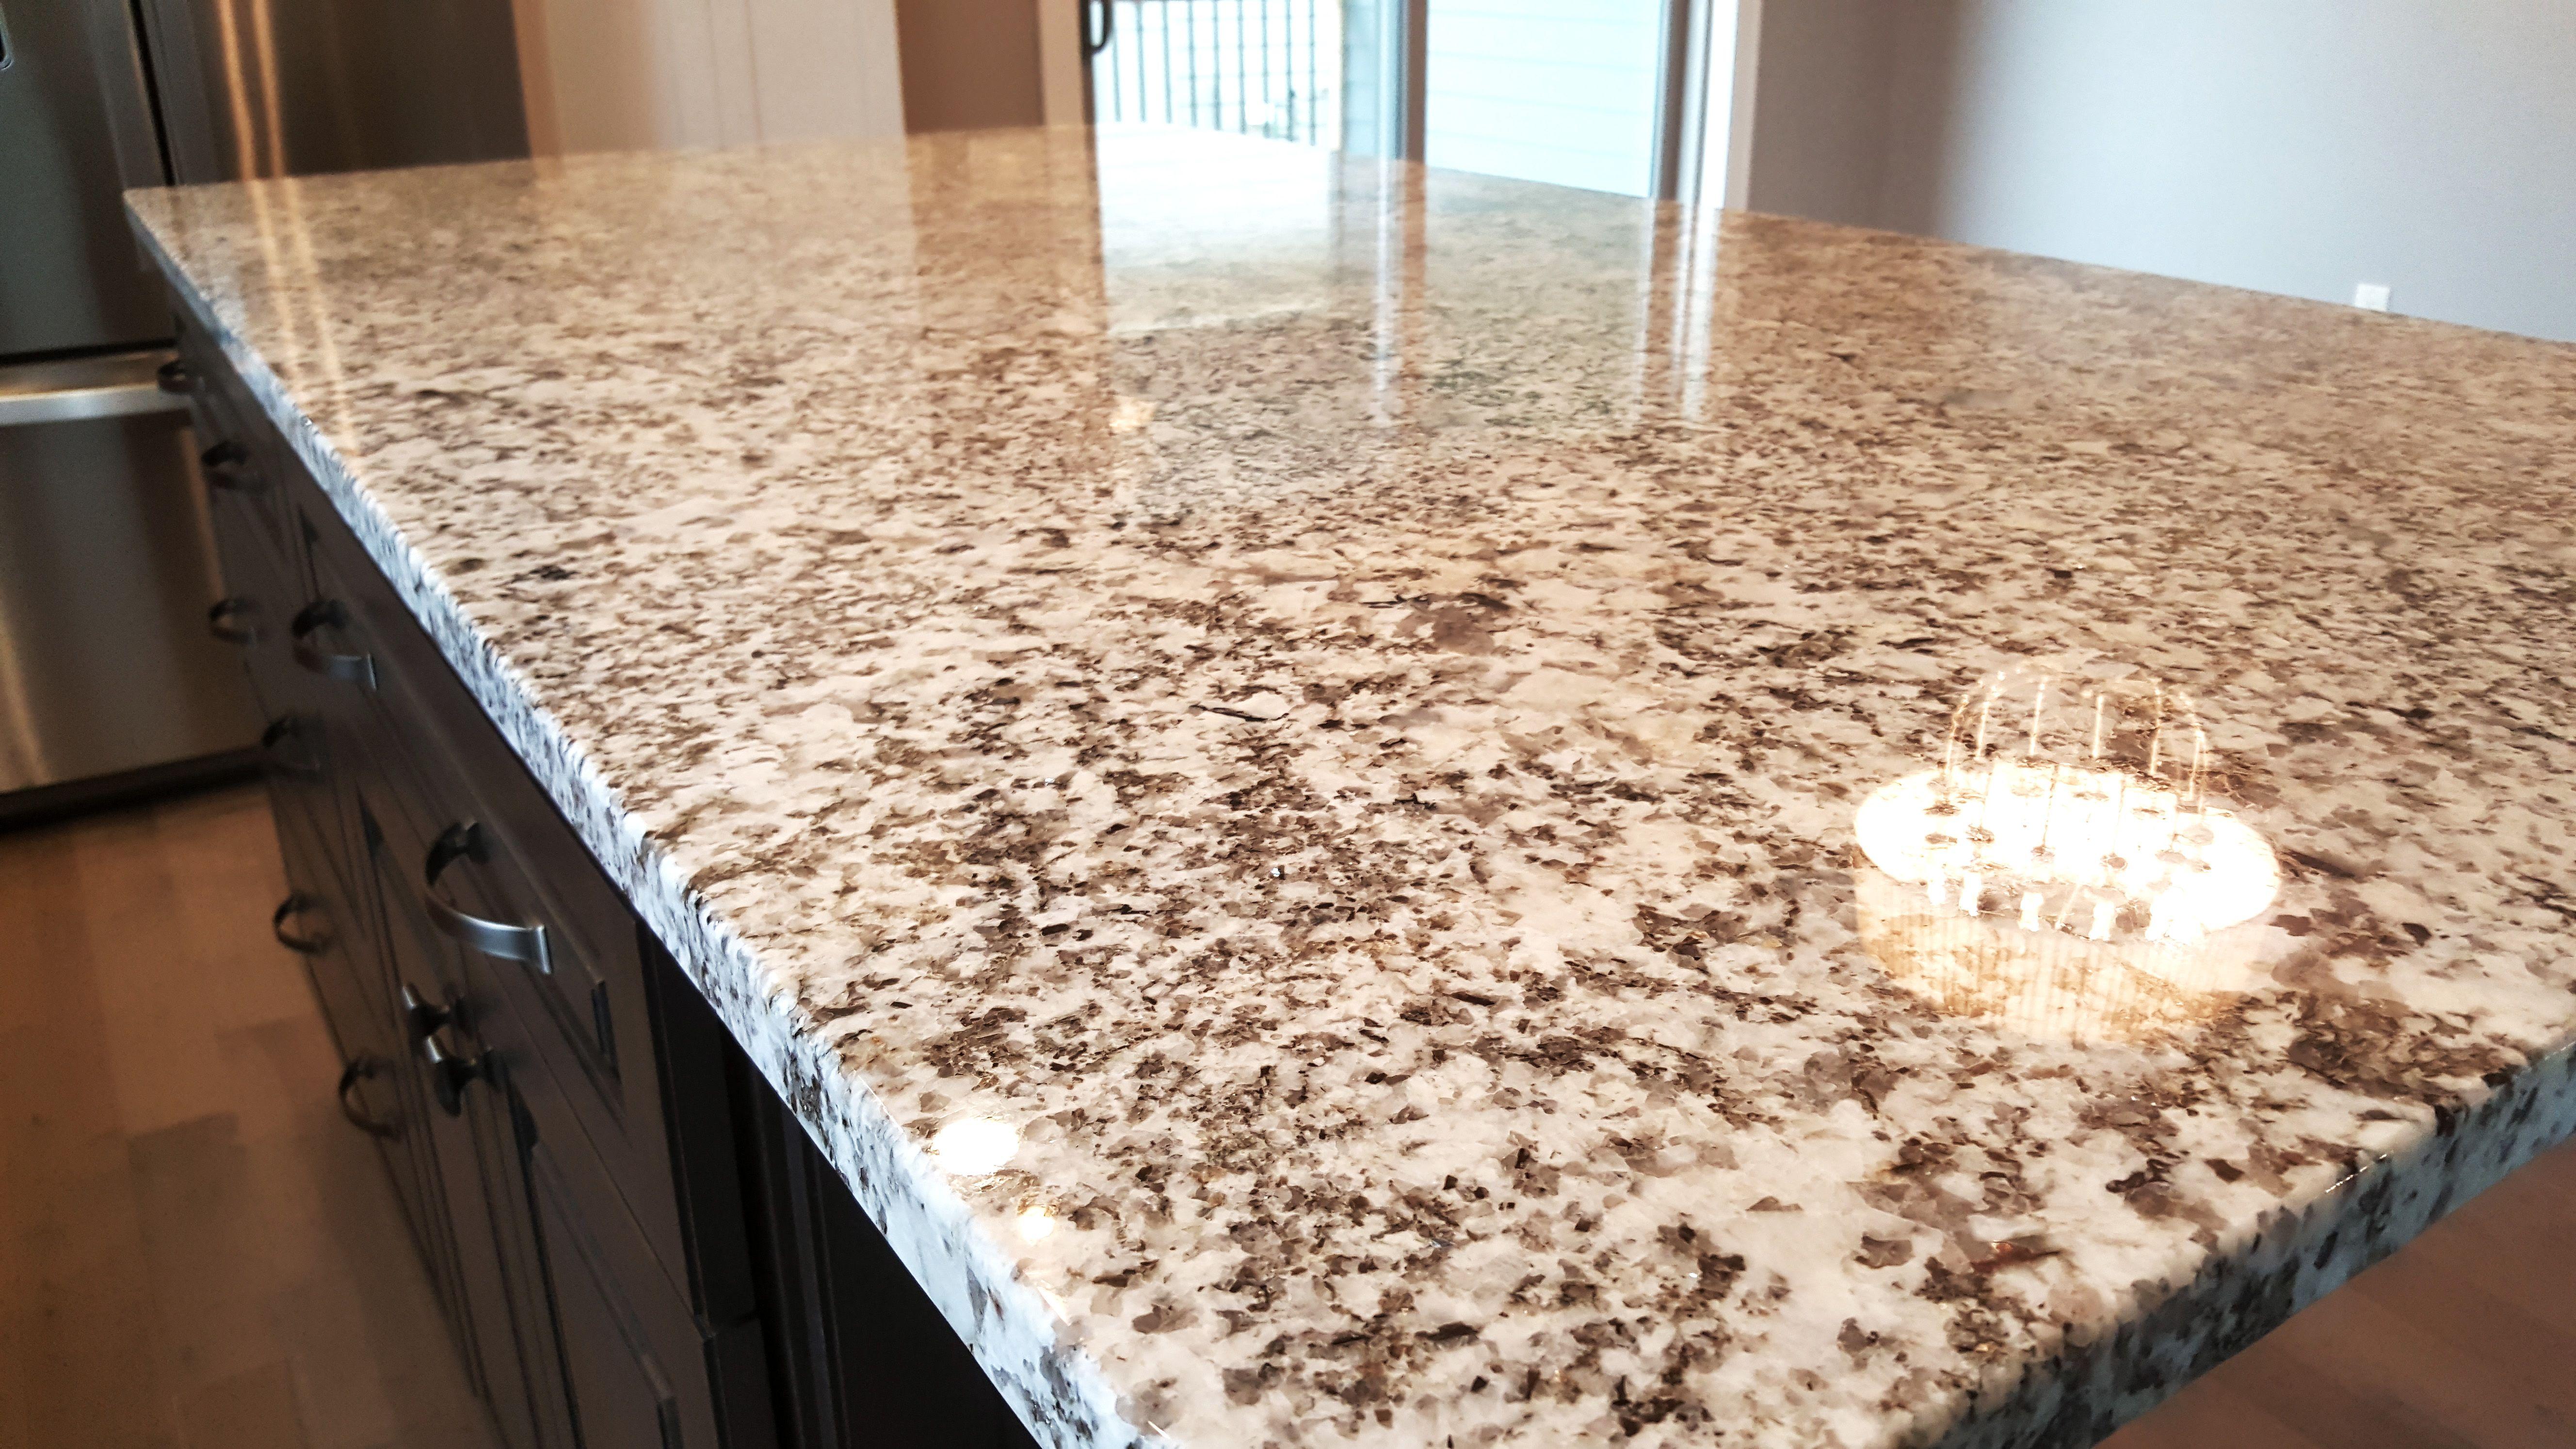 Sienna White Granite Granite Countertops White Granite Countertops